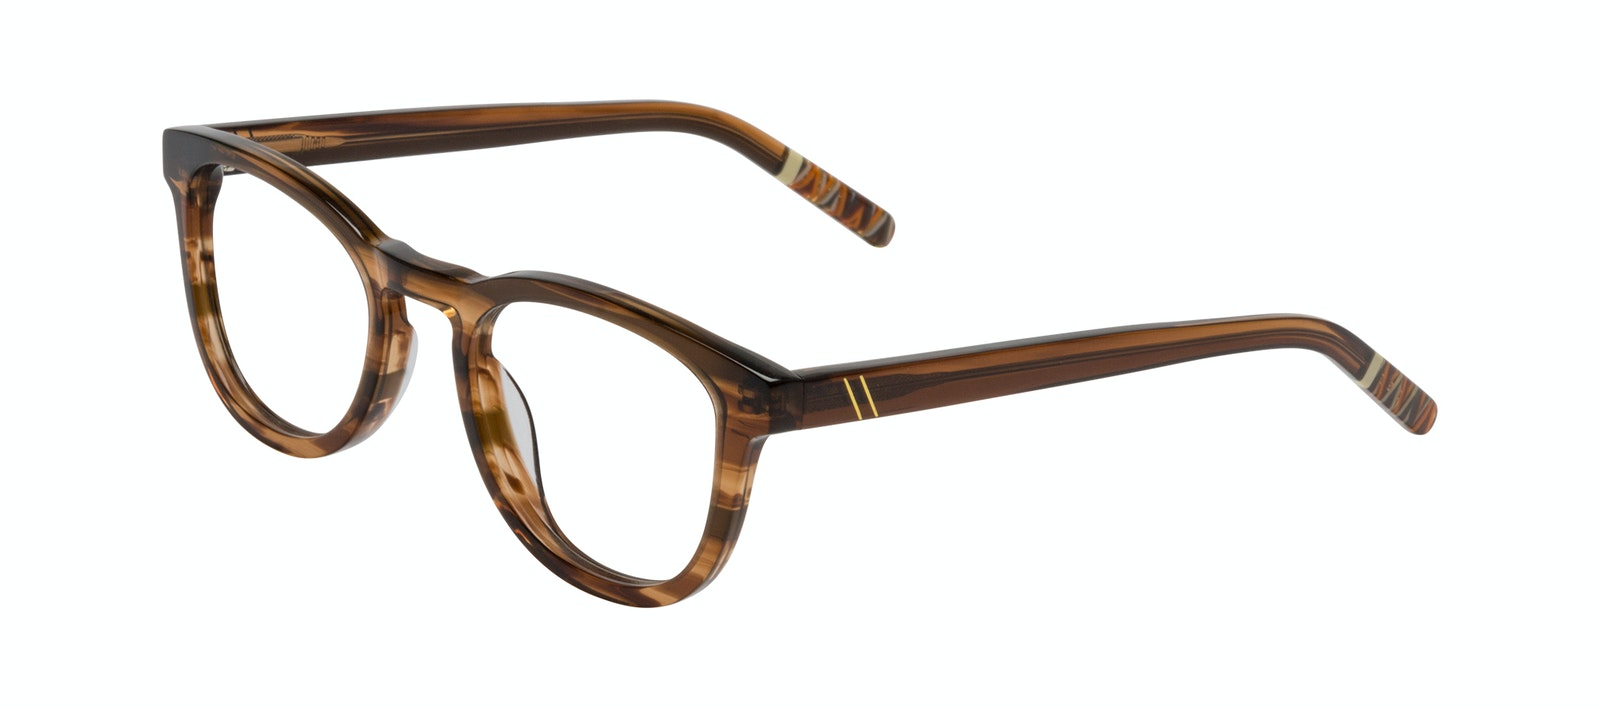 Affordable Fashion Glasses Round Eyeglasses Men Goal Smokey Havana Tilt